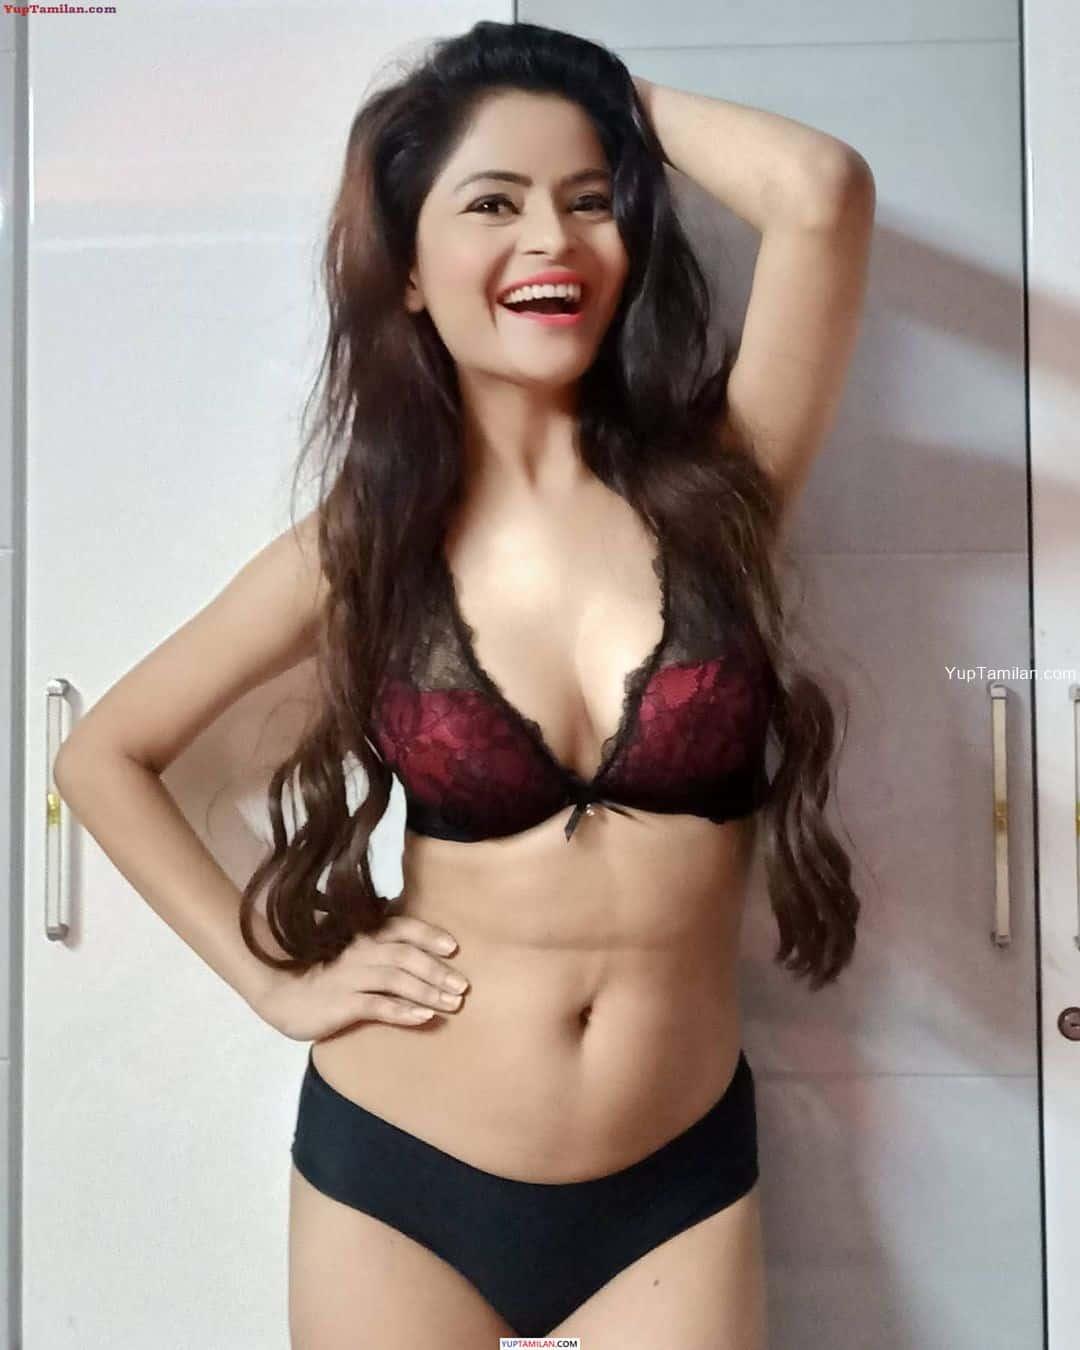 Gehana Vasisth sexy Photos in Lingerie, Bikini- Boobs cleavage Pics